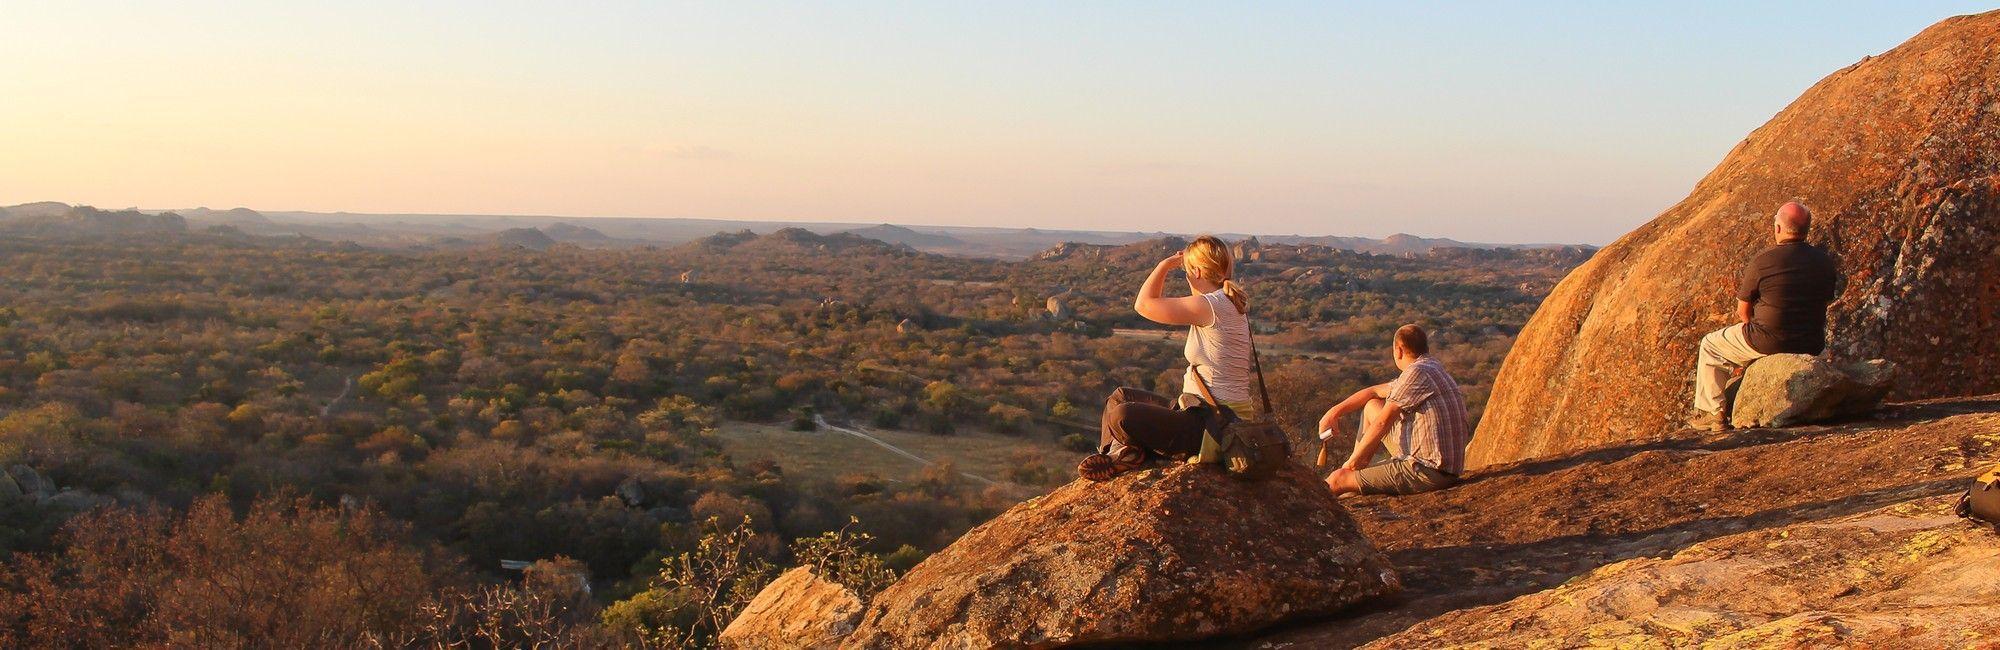 Groeps rondreis Zuid-Afrika, Zimbabwe, Botswana